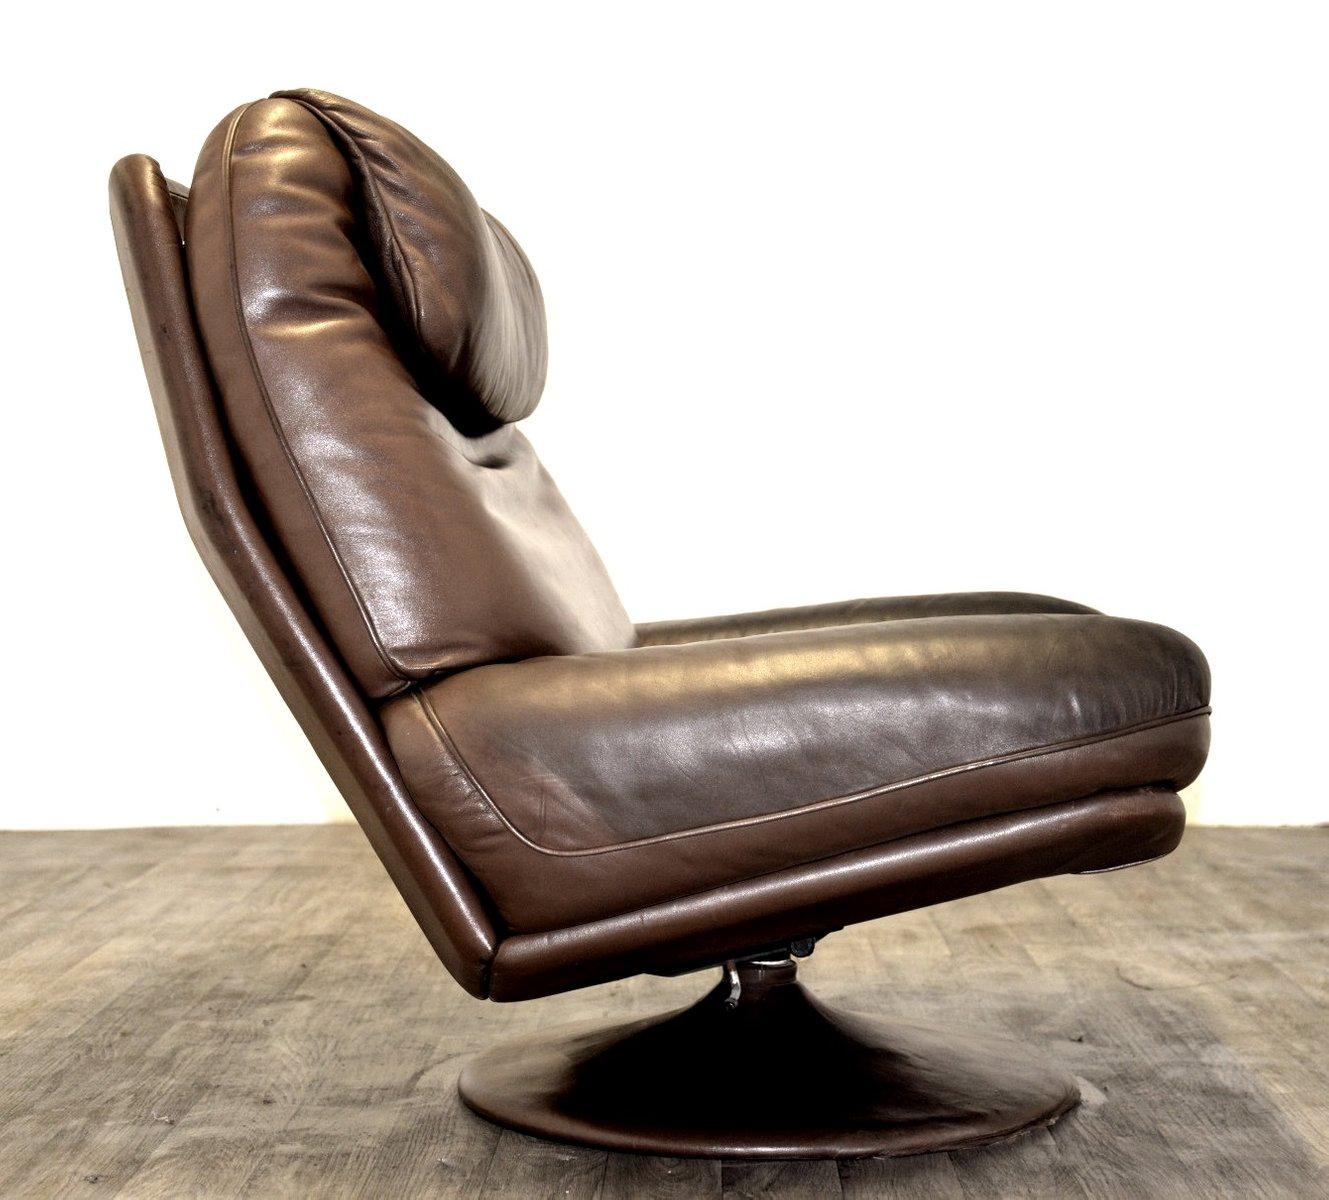 vintage sessel und ottomane von de sede 1970er bei pamono. Black Bedroom Furniture Sets. Home Design Ideas